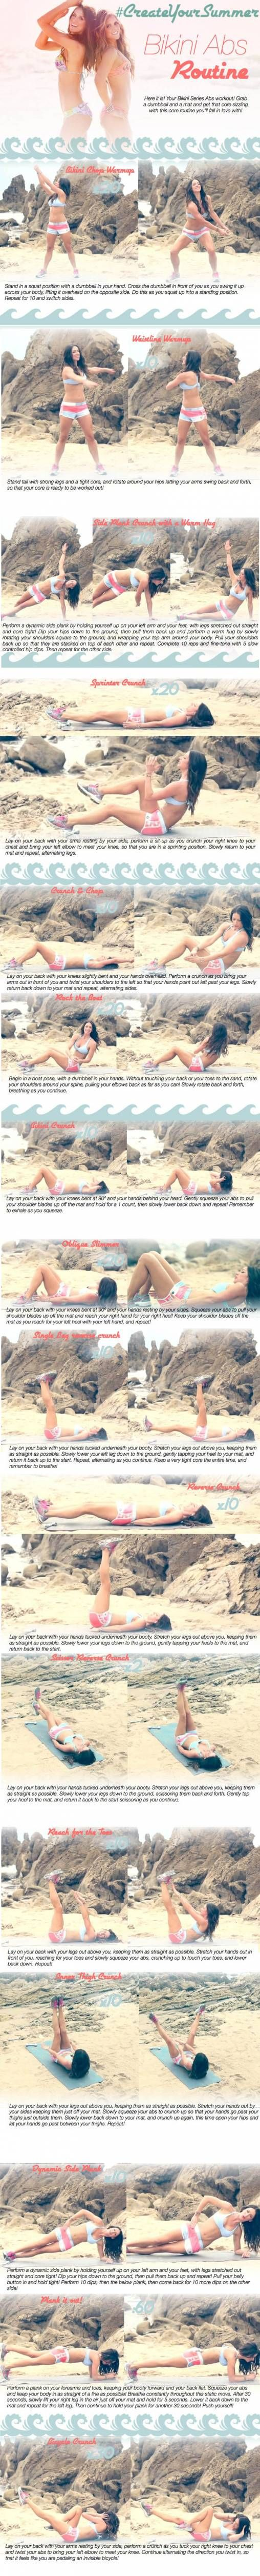 tone It UP bikini series Bikini Abs Printable pinterest